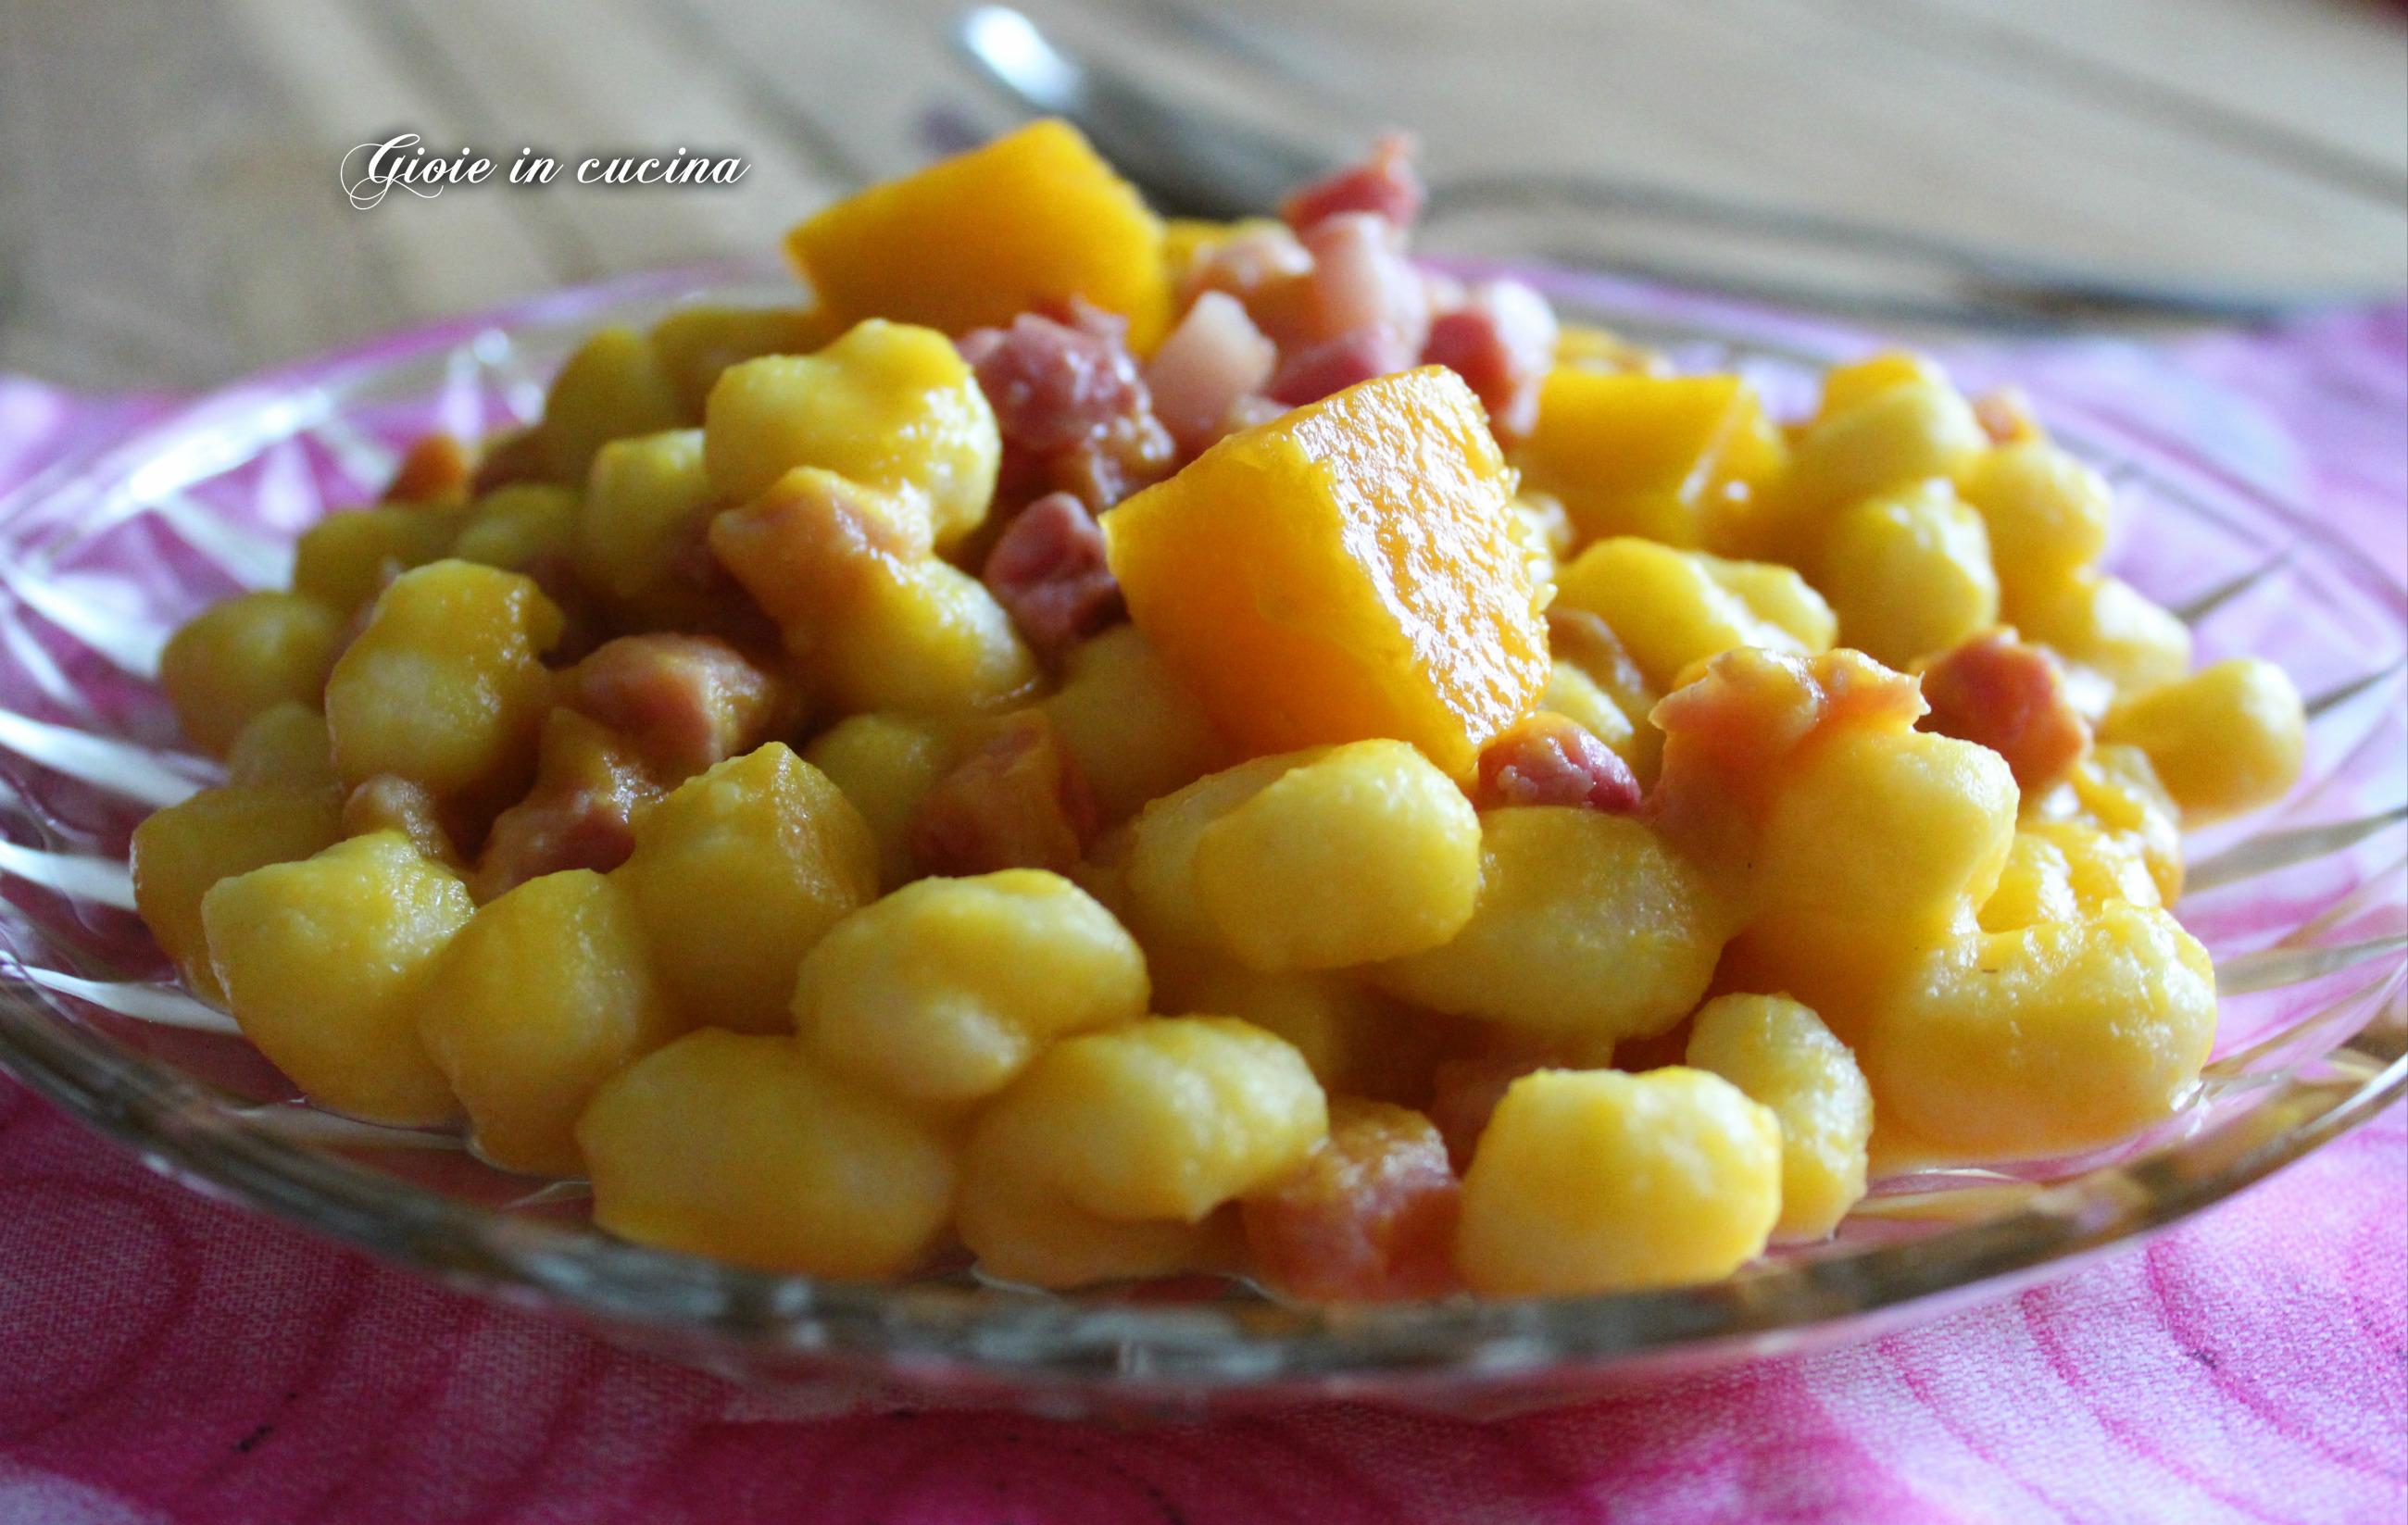 Ricetta Gnocchi Zucca E Pancetta.Gnocchetti Con Crema Di Zucca E Pancetta Gioie In Cucina